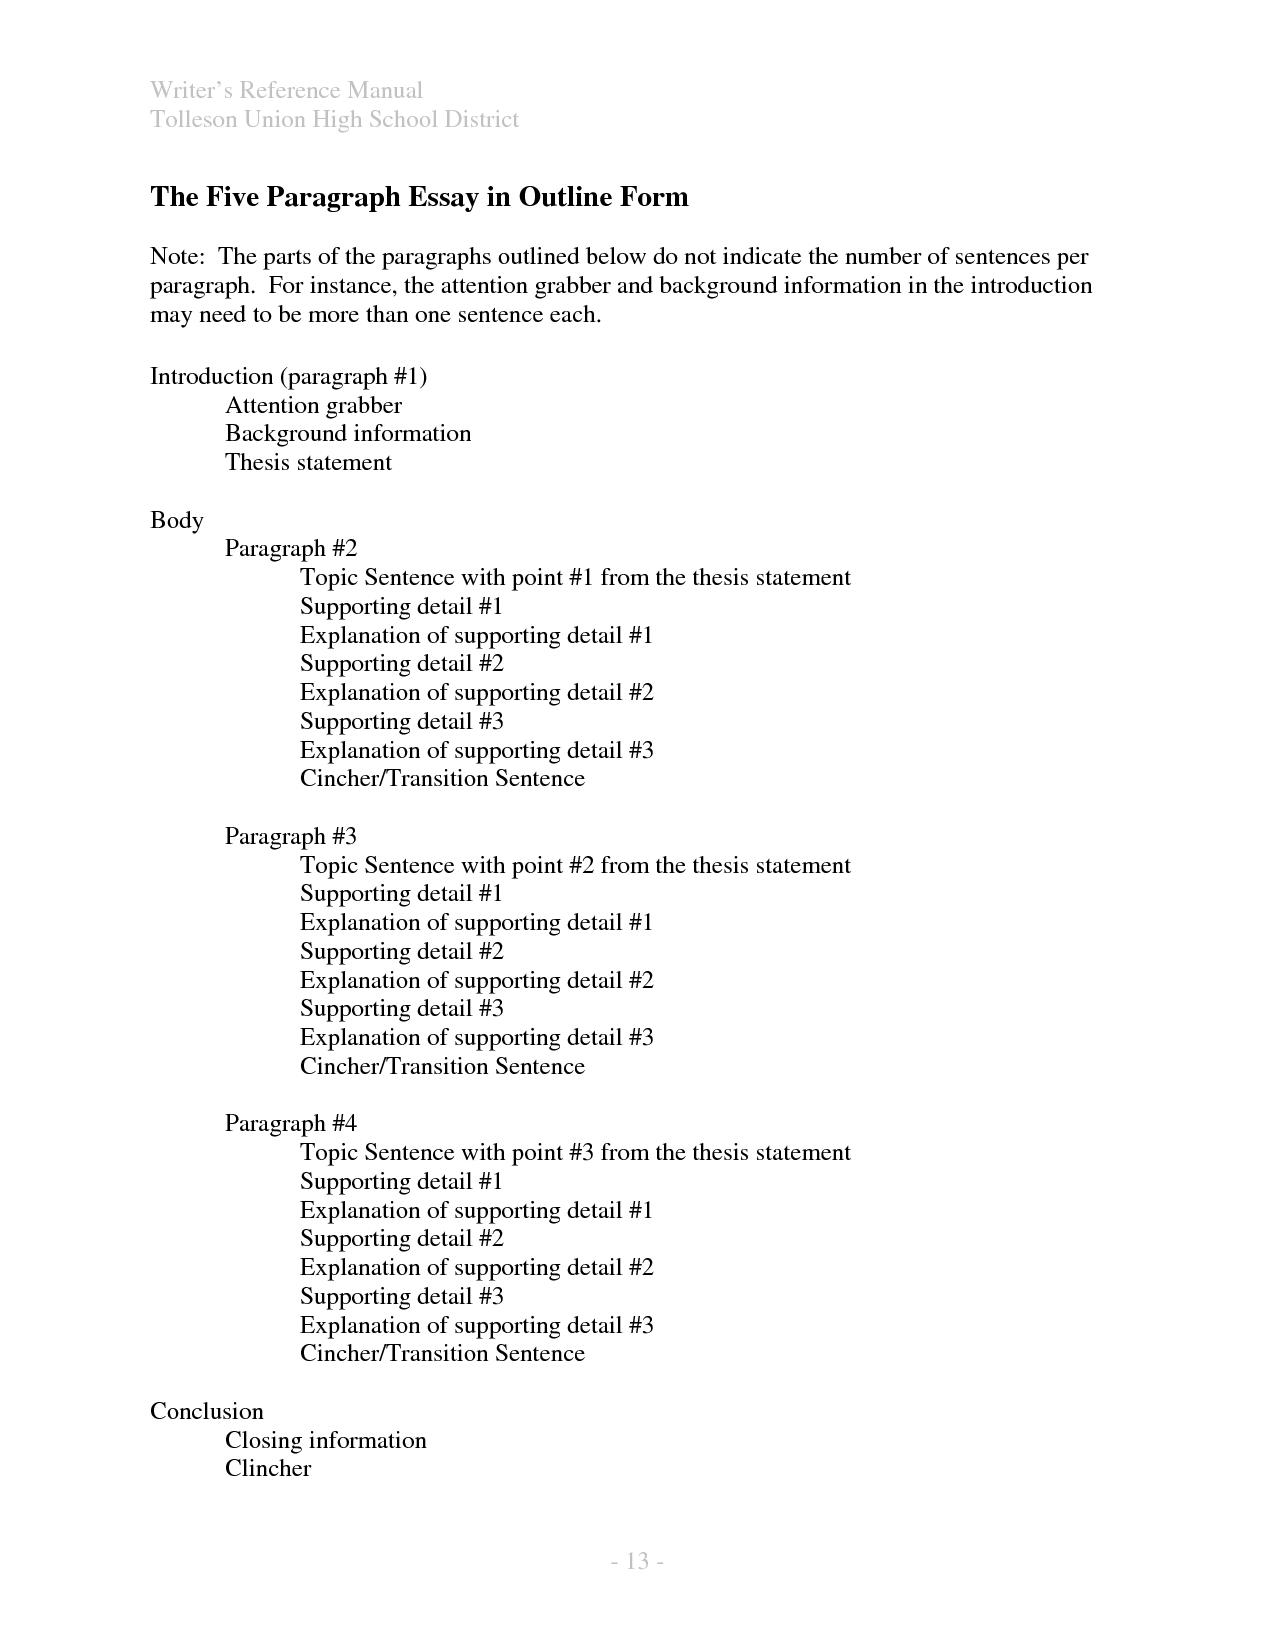 005 Argumentative Essay College Outline Pdf Printables Corner Seaapi Com Wp Content Uploads Argumentativ Caus Stupendous Sample Template Persuasive Topics Middle School Full